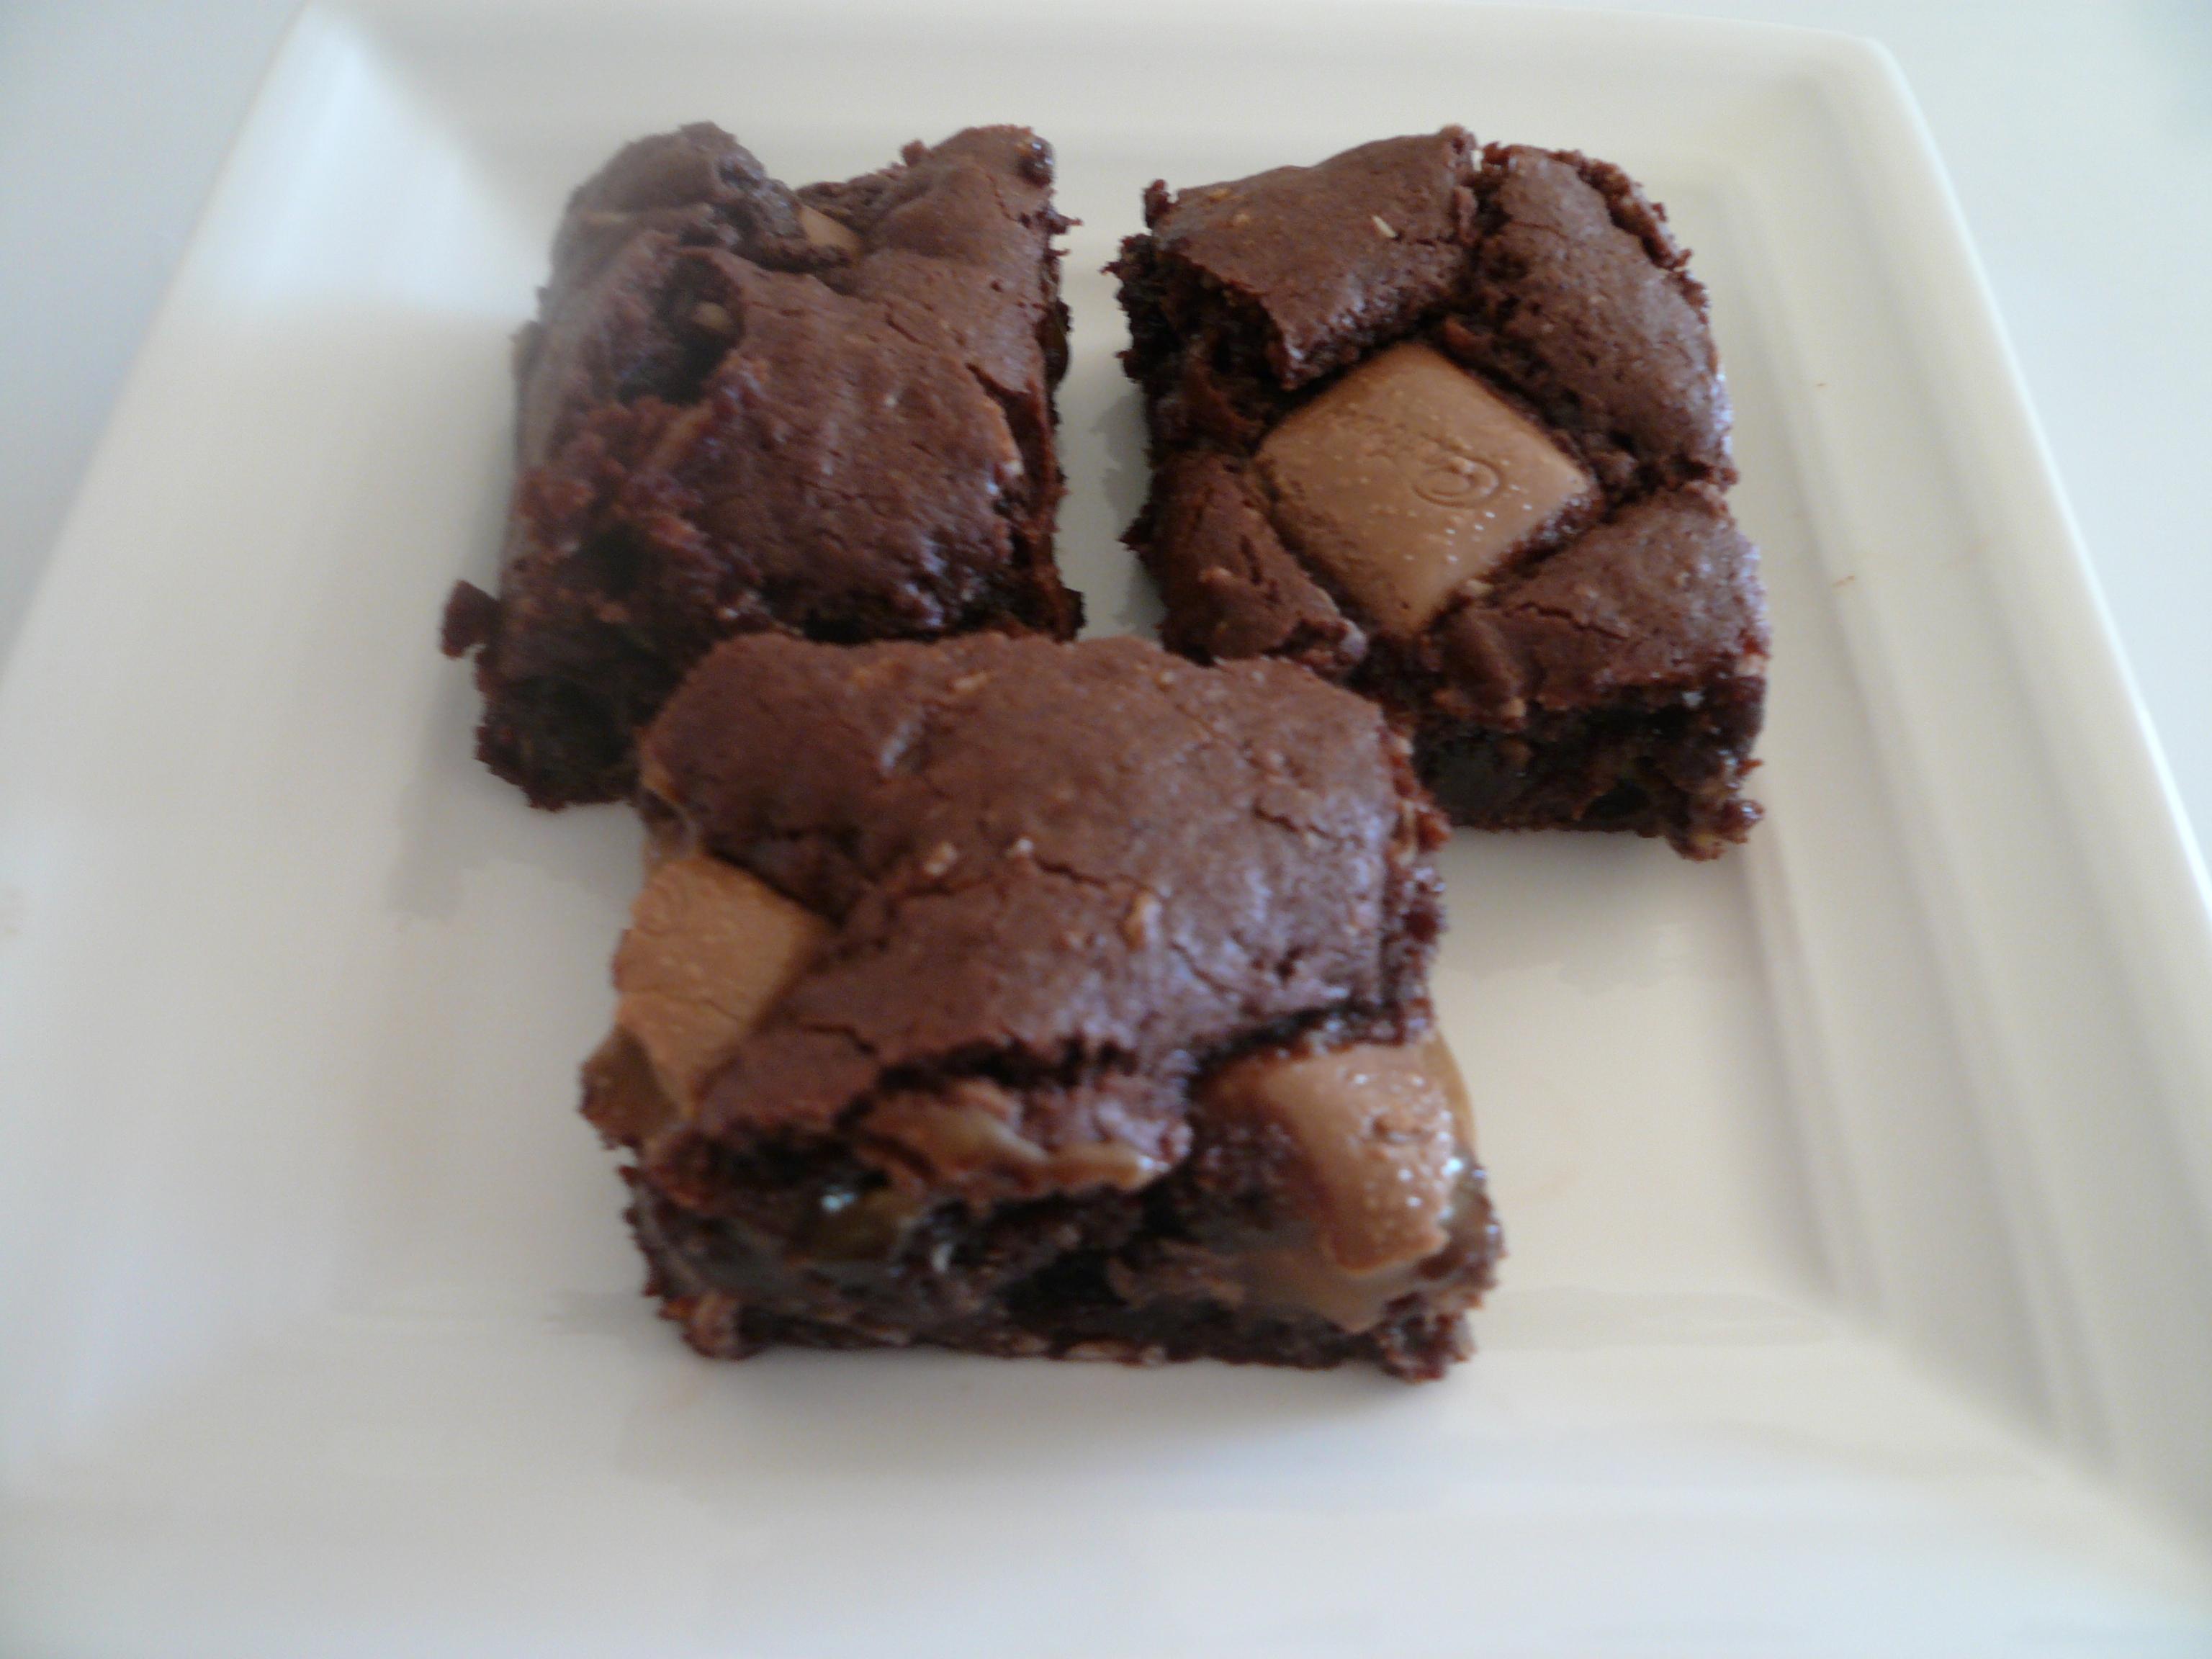 Chocolate Fudge Slice With Caramello Chocolate